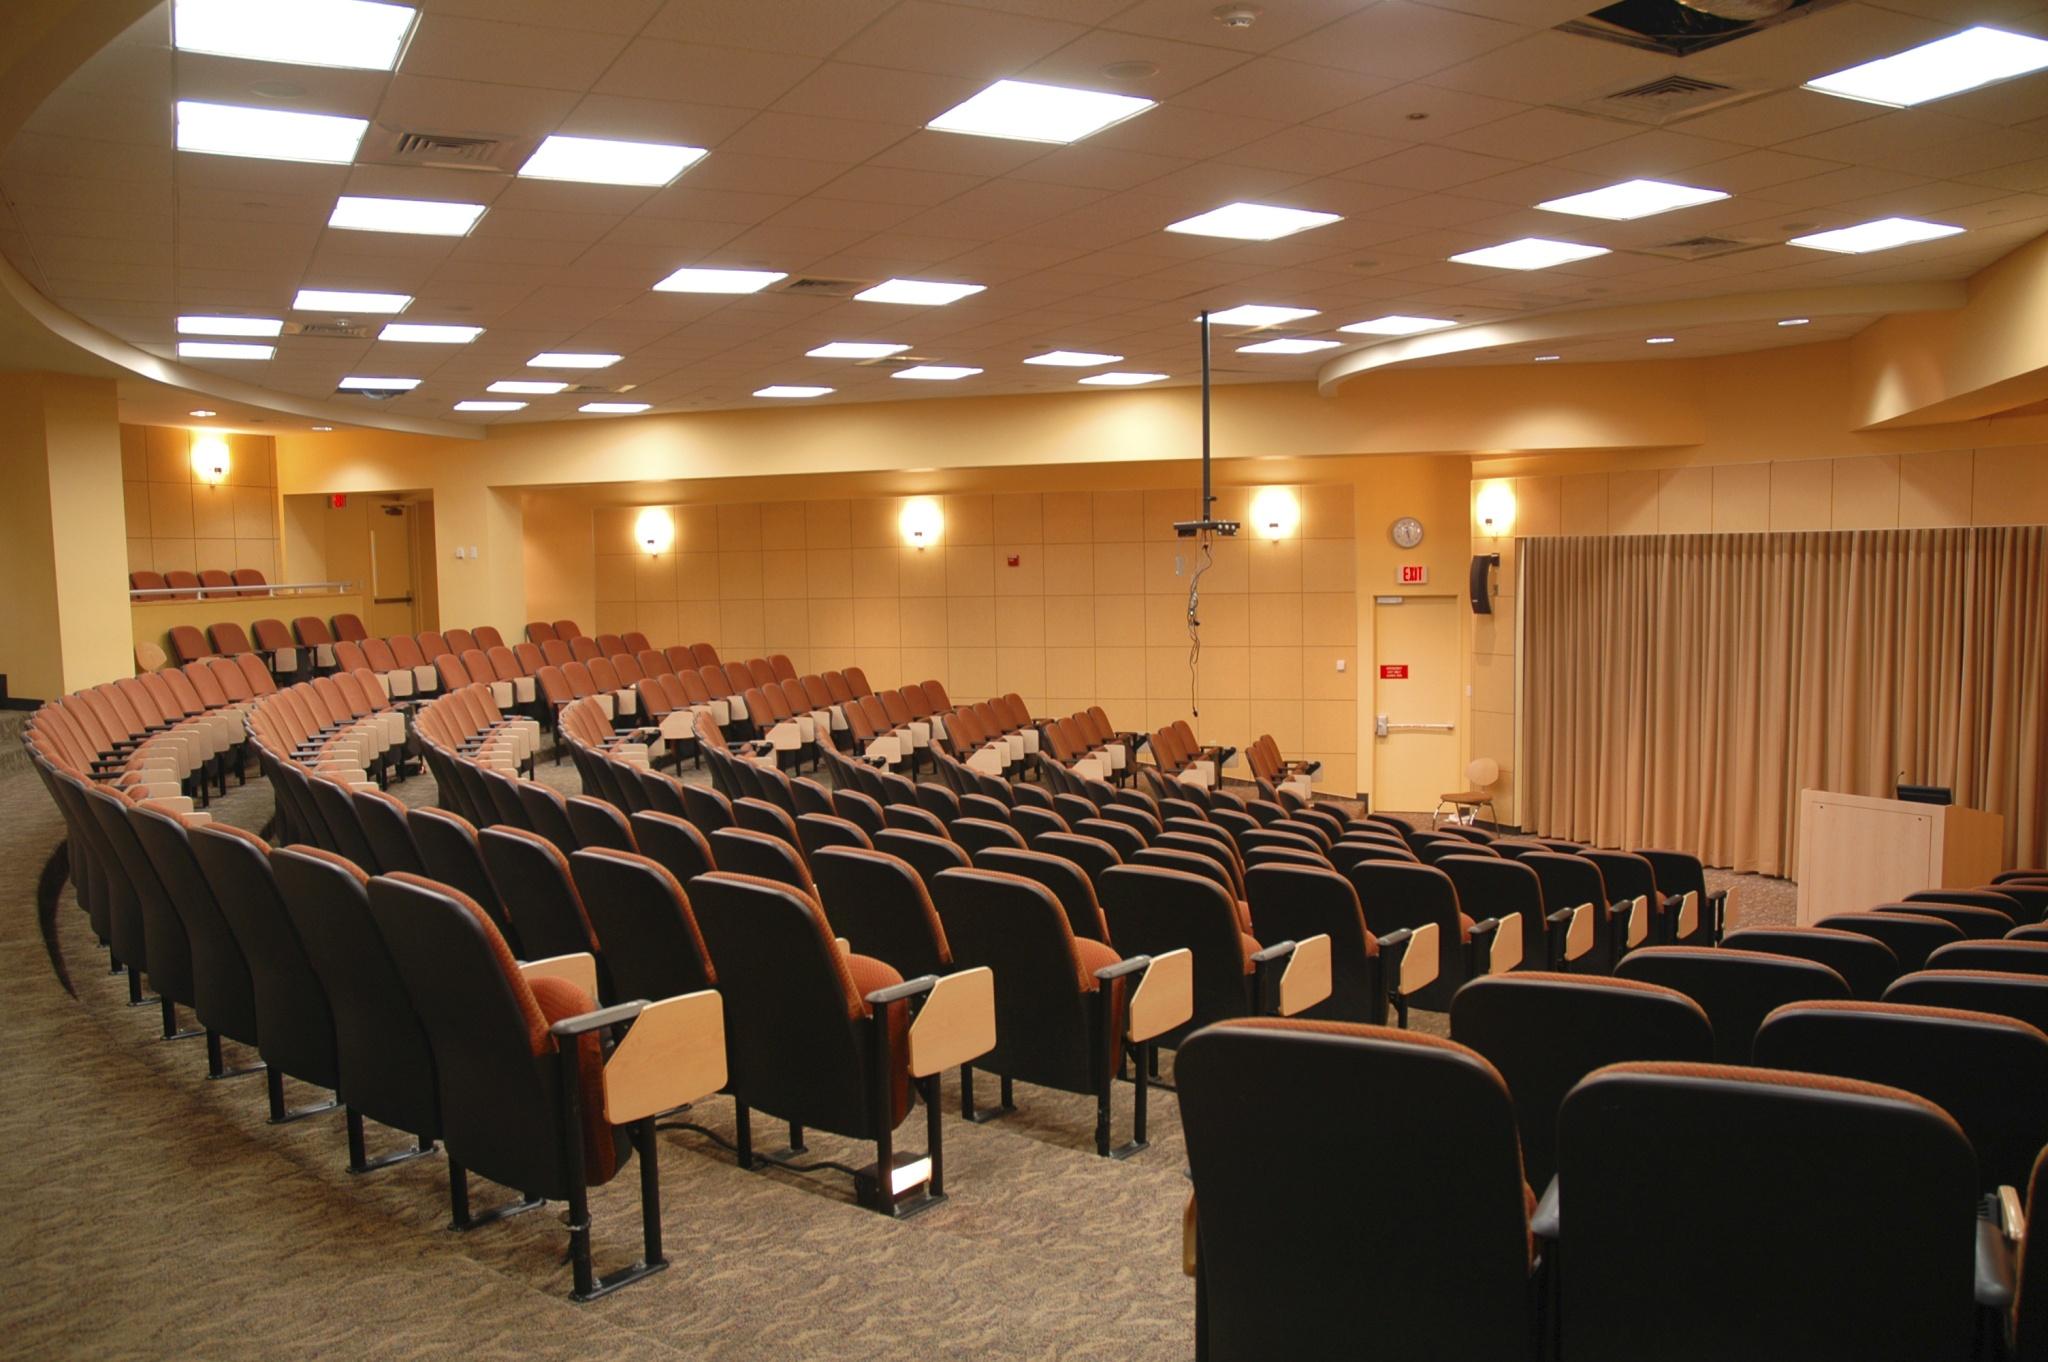 Tufts-University-ASEAN-Center.jpg